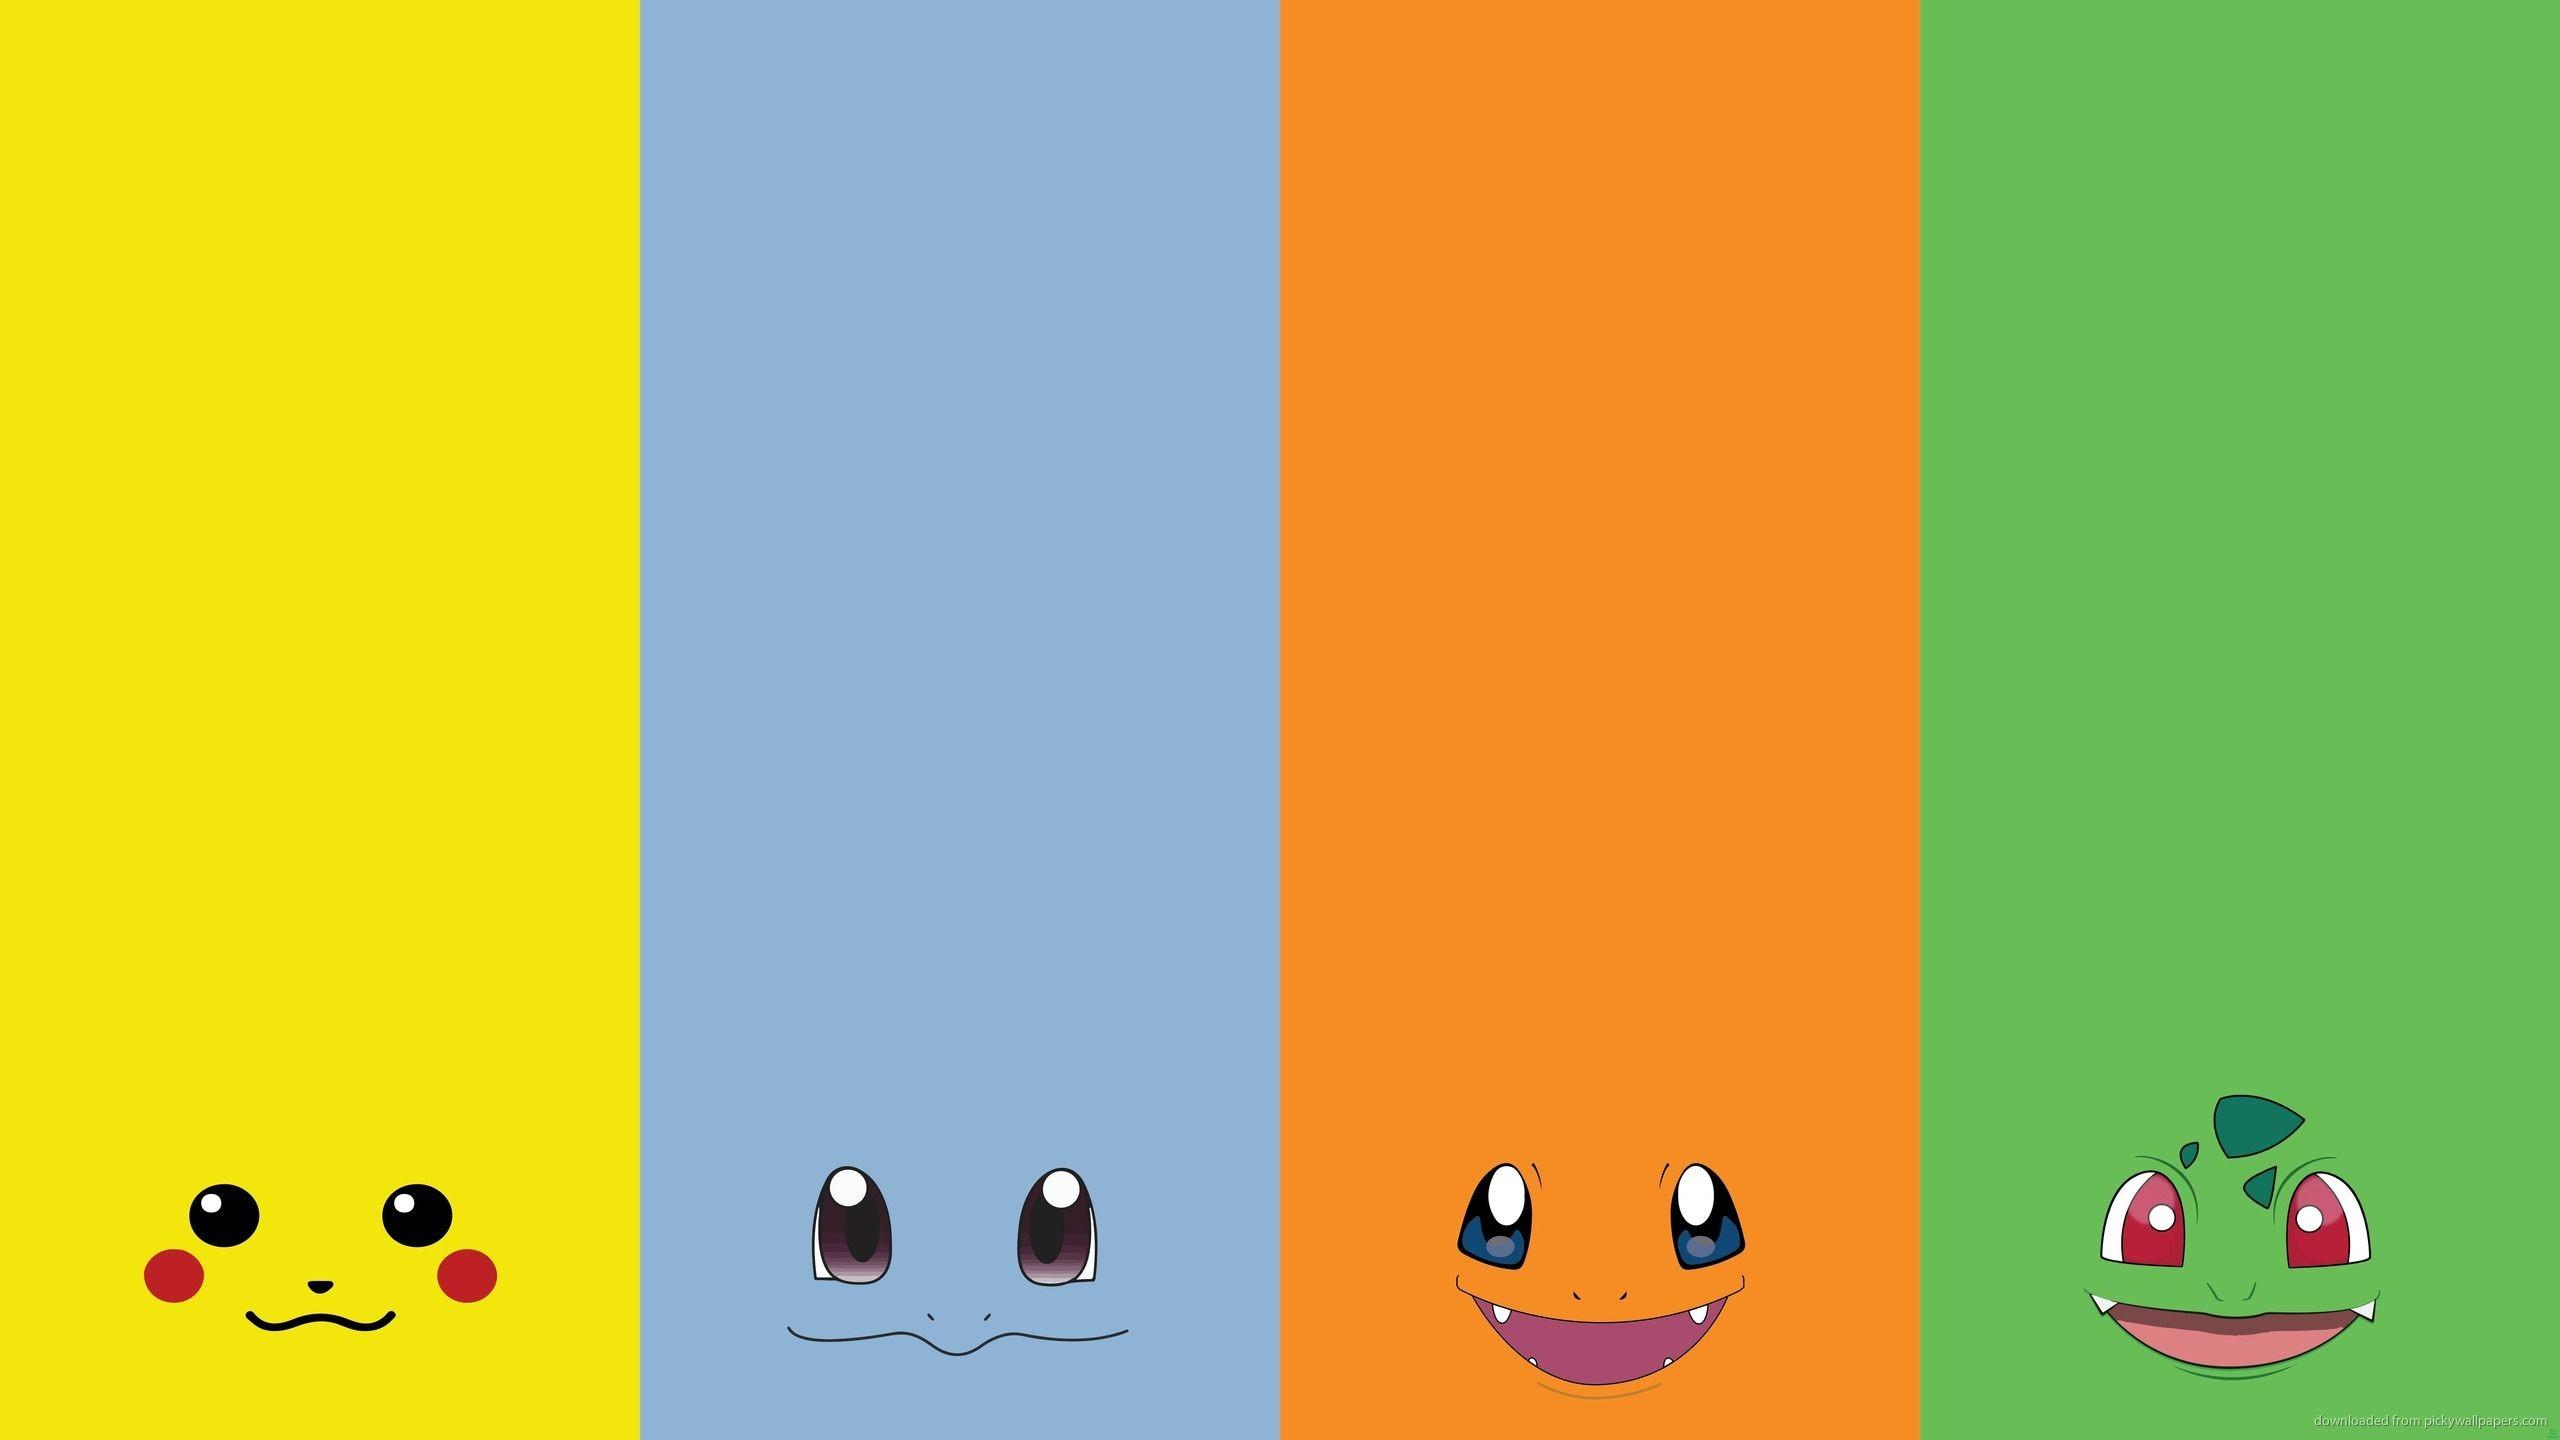 Download Four Pokemon Faces Wallpaper